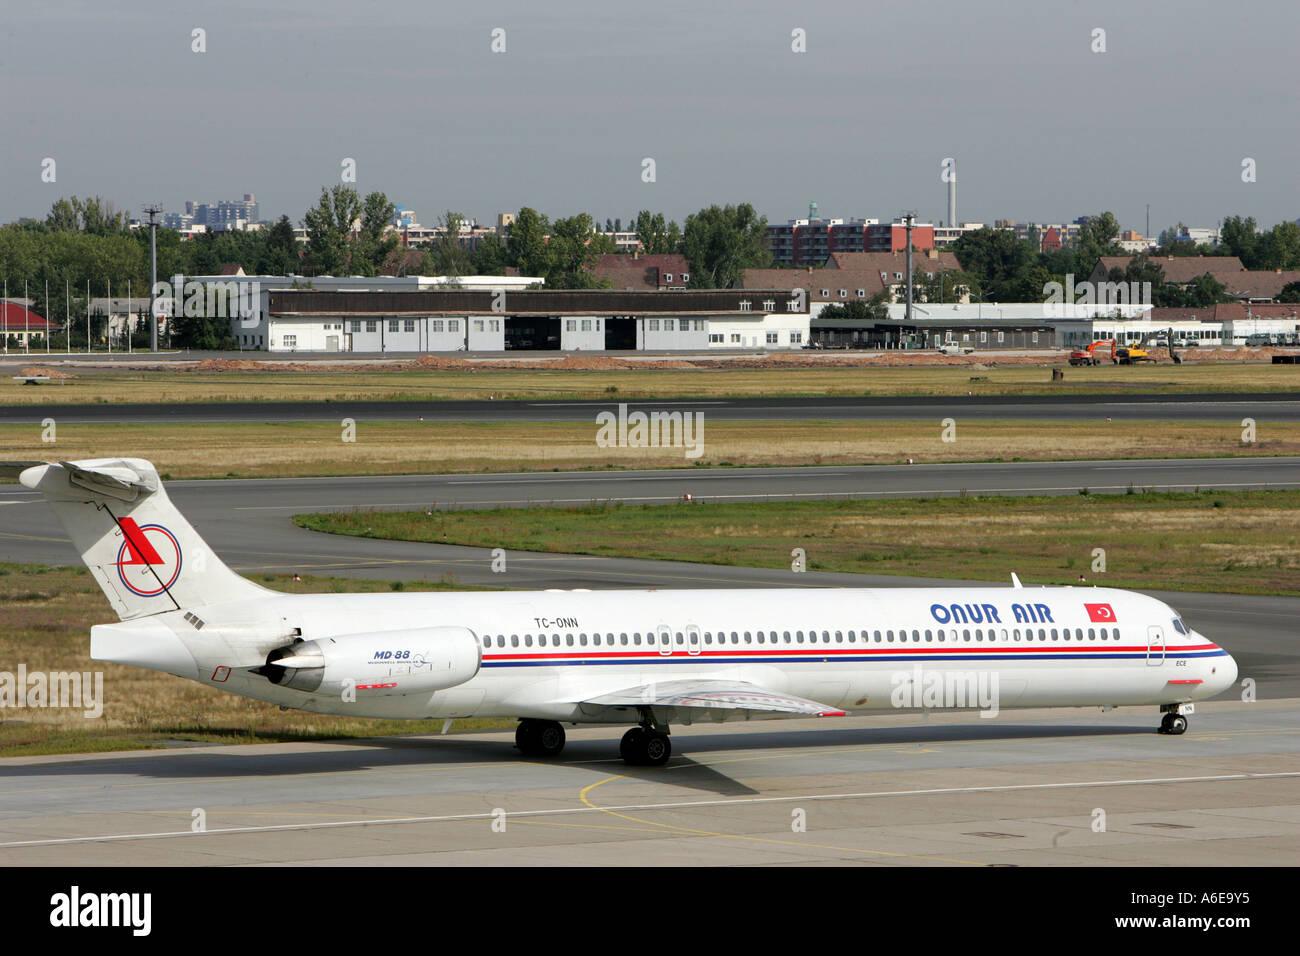 Onur Air airplane at Tegel airport, Berlin - Stock Image